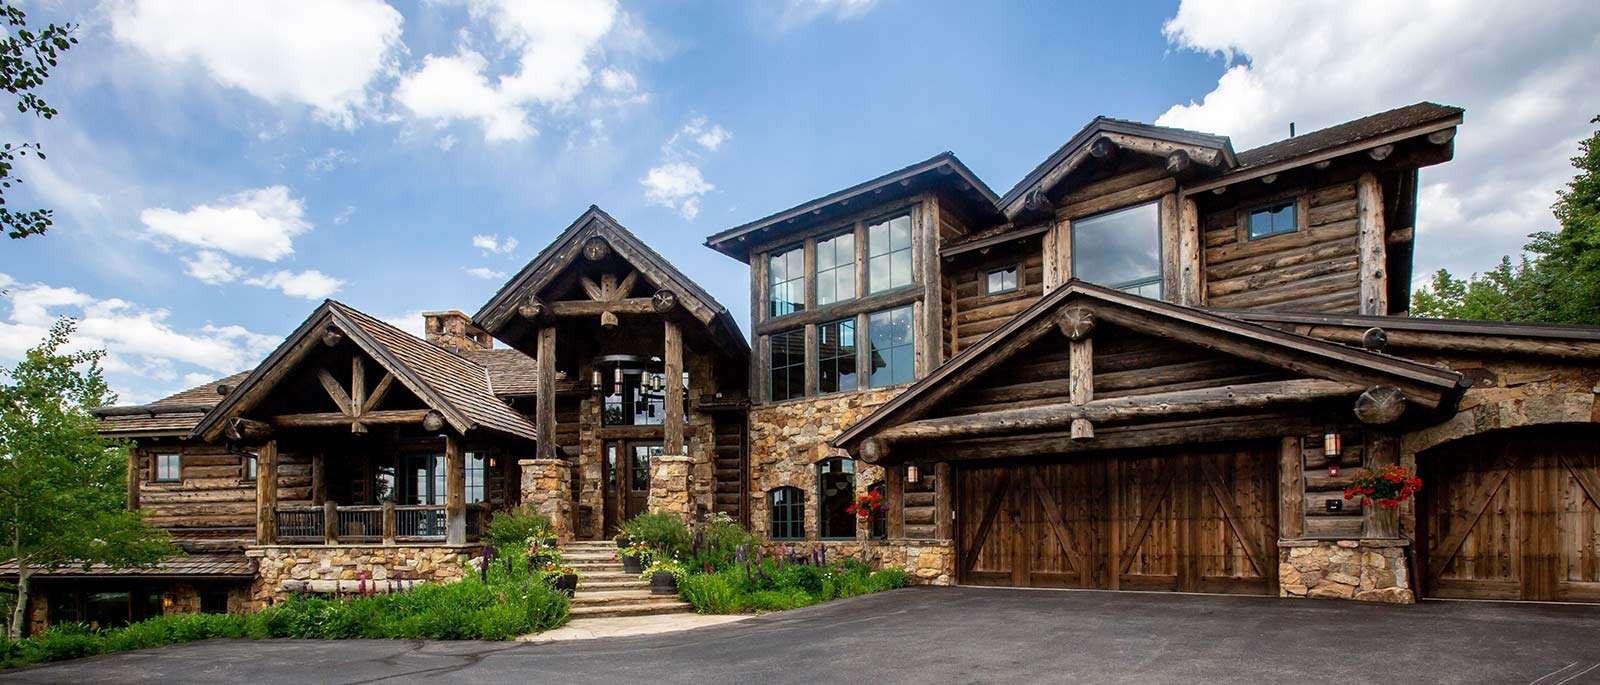 Luxury vacation rentals usa - Colorado - Avon - Bachelor gulch - 2139 Daybreak Ridge - Image 1/51